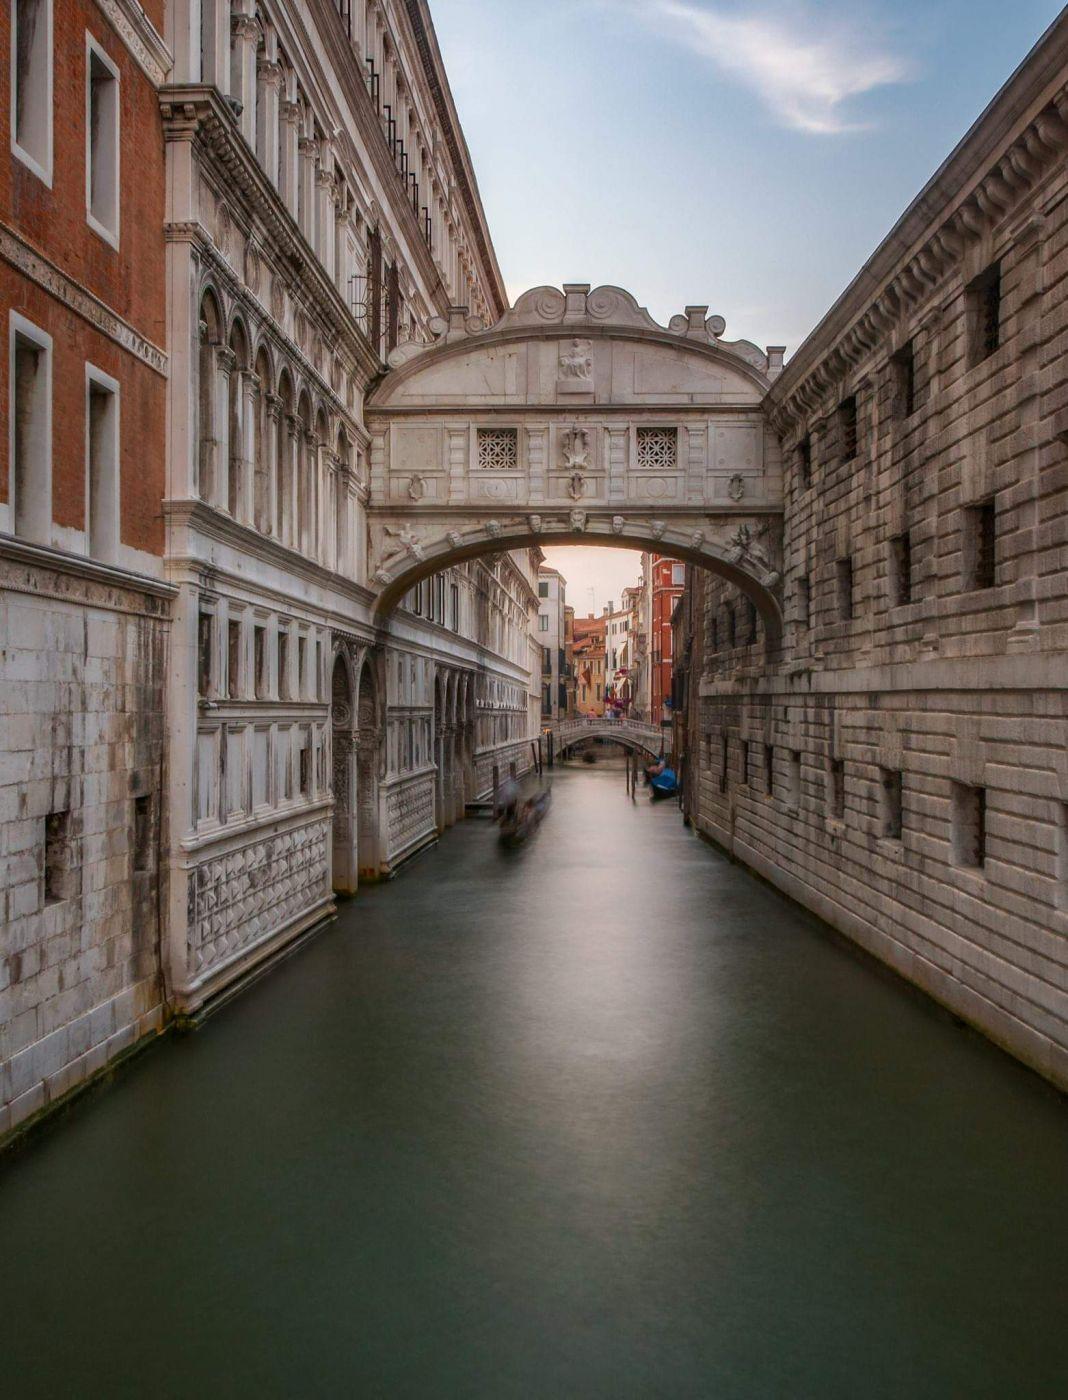 Bridge of sighs, Italy